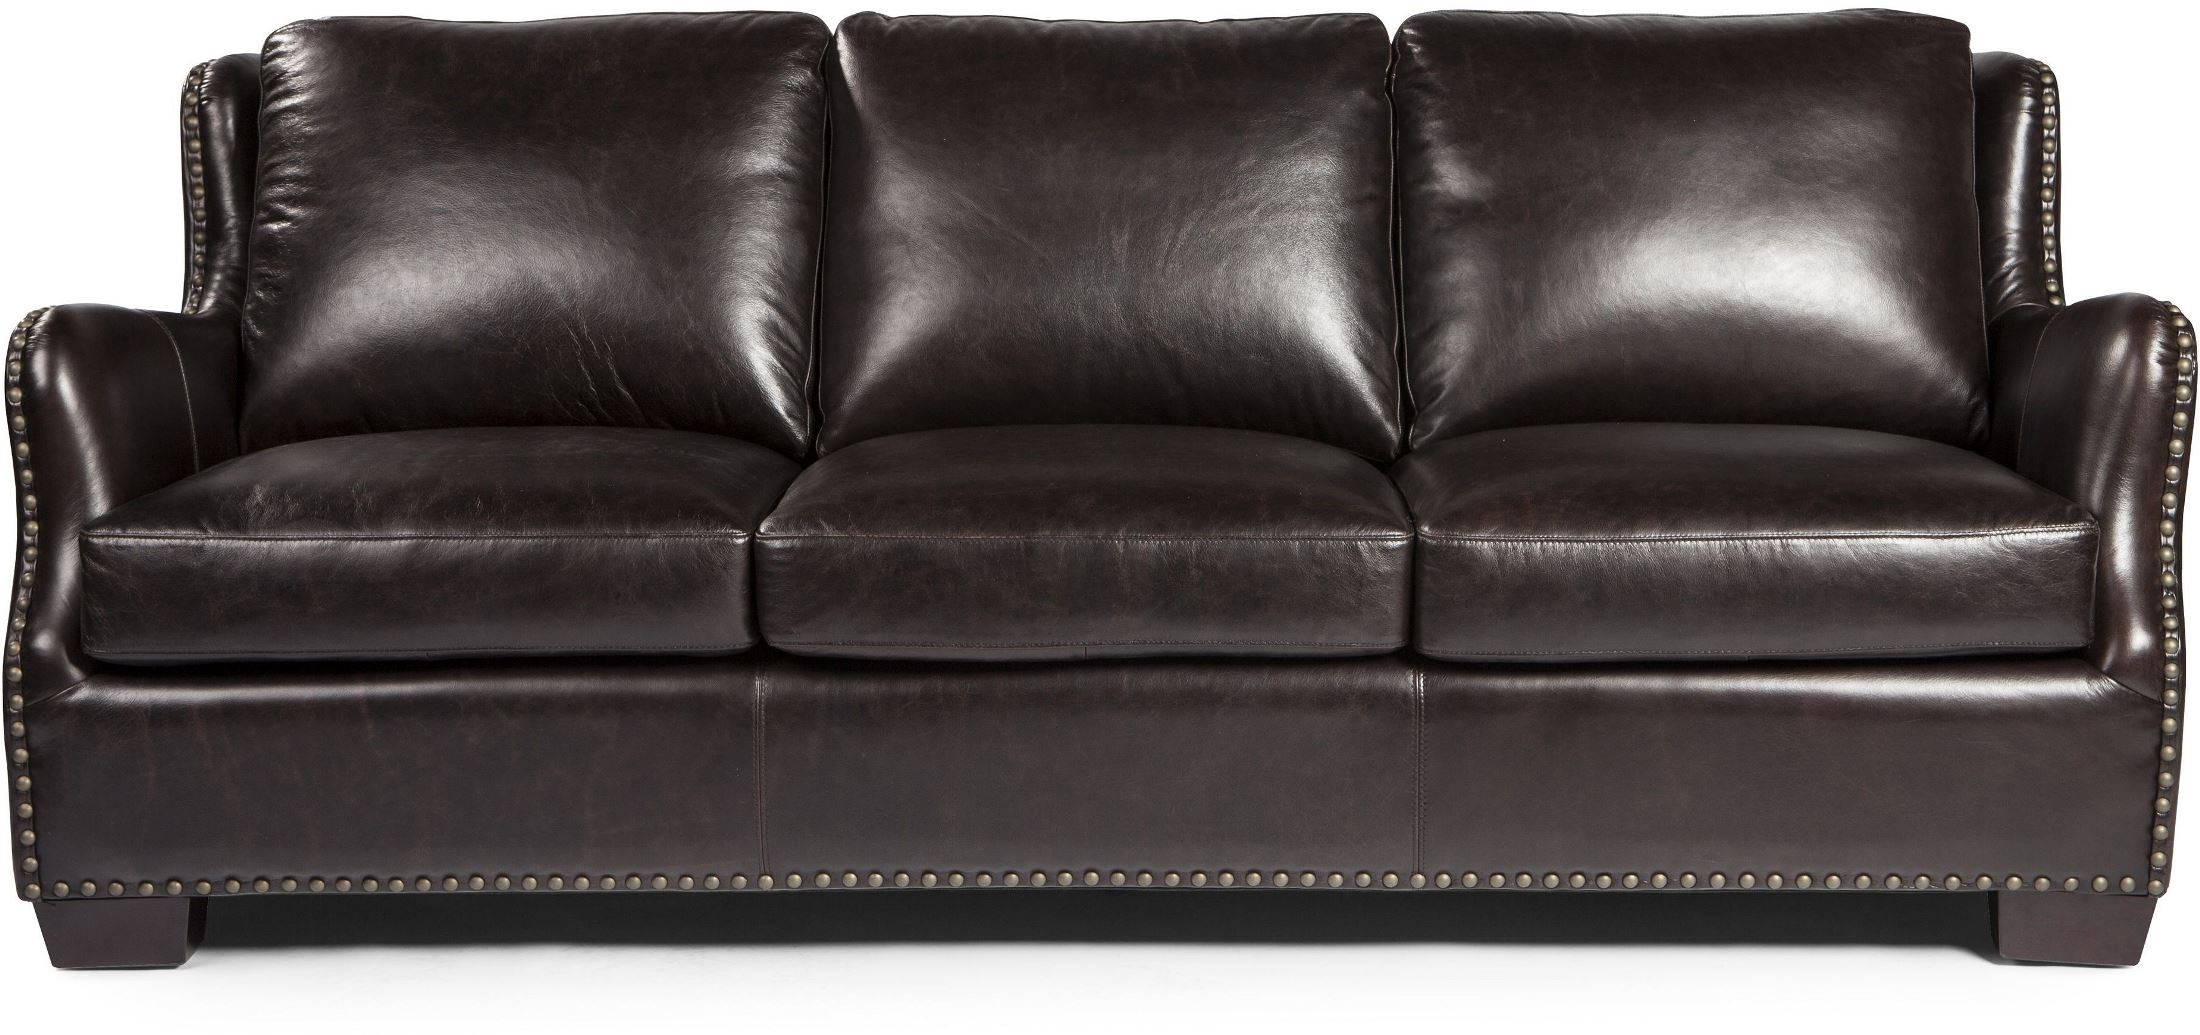 next brompton leather sofa warehouse uk vicar chocolate from lazzaro